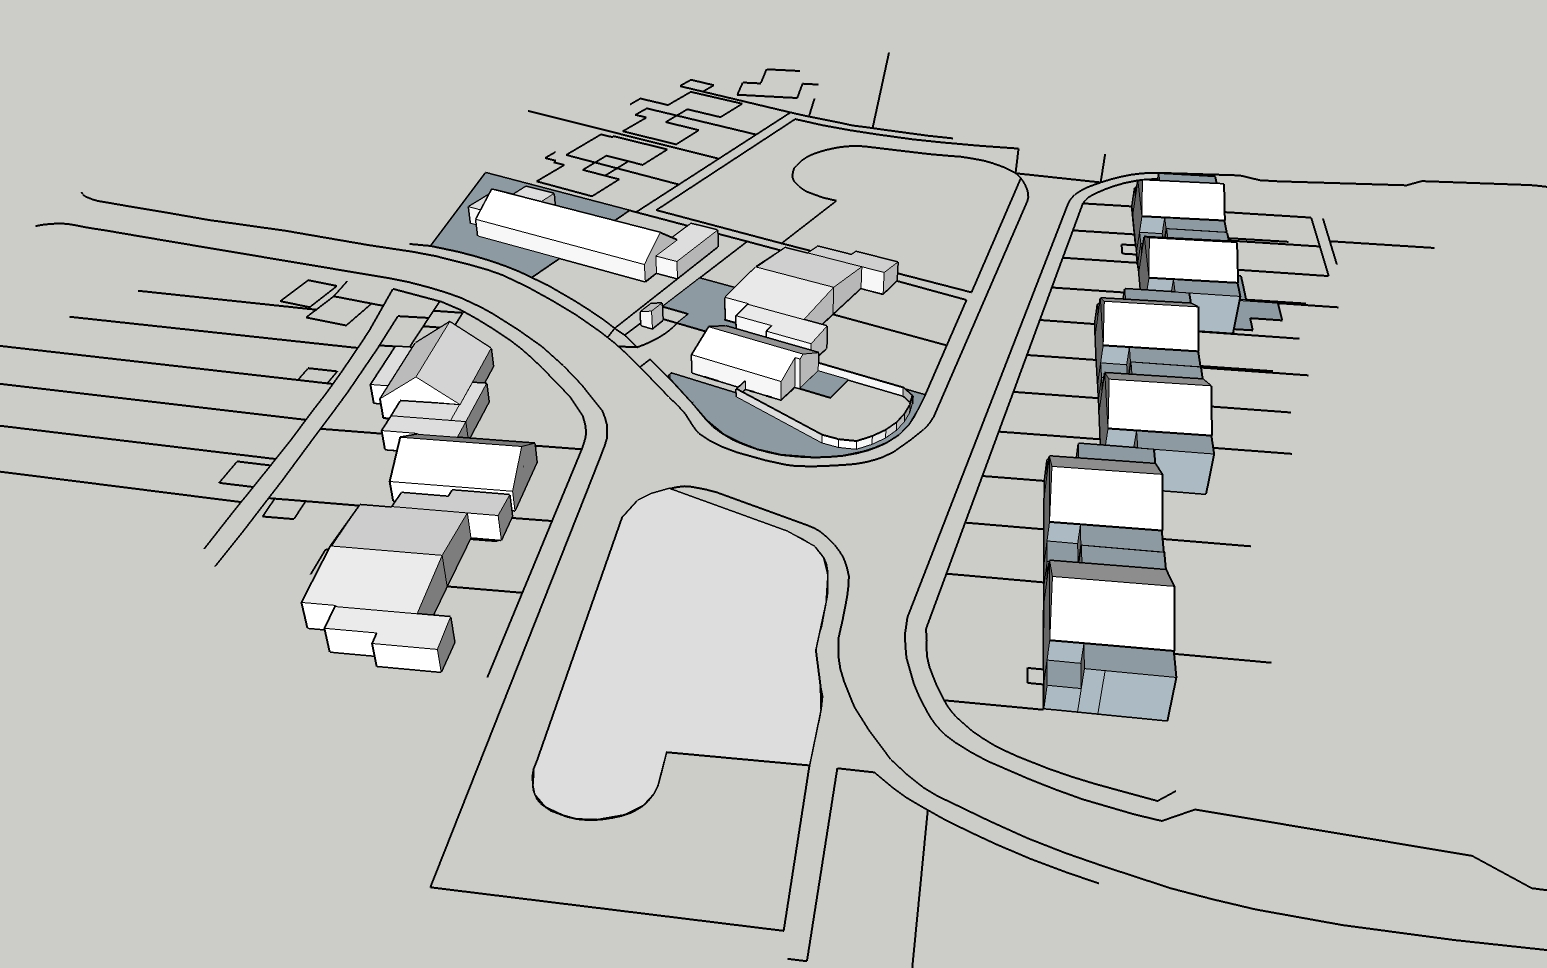 3D sketchup urban design.jpg